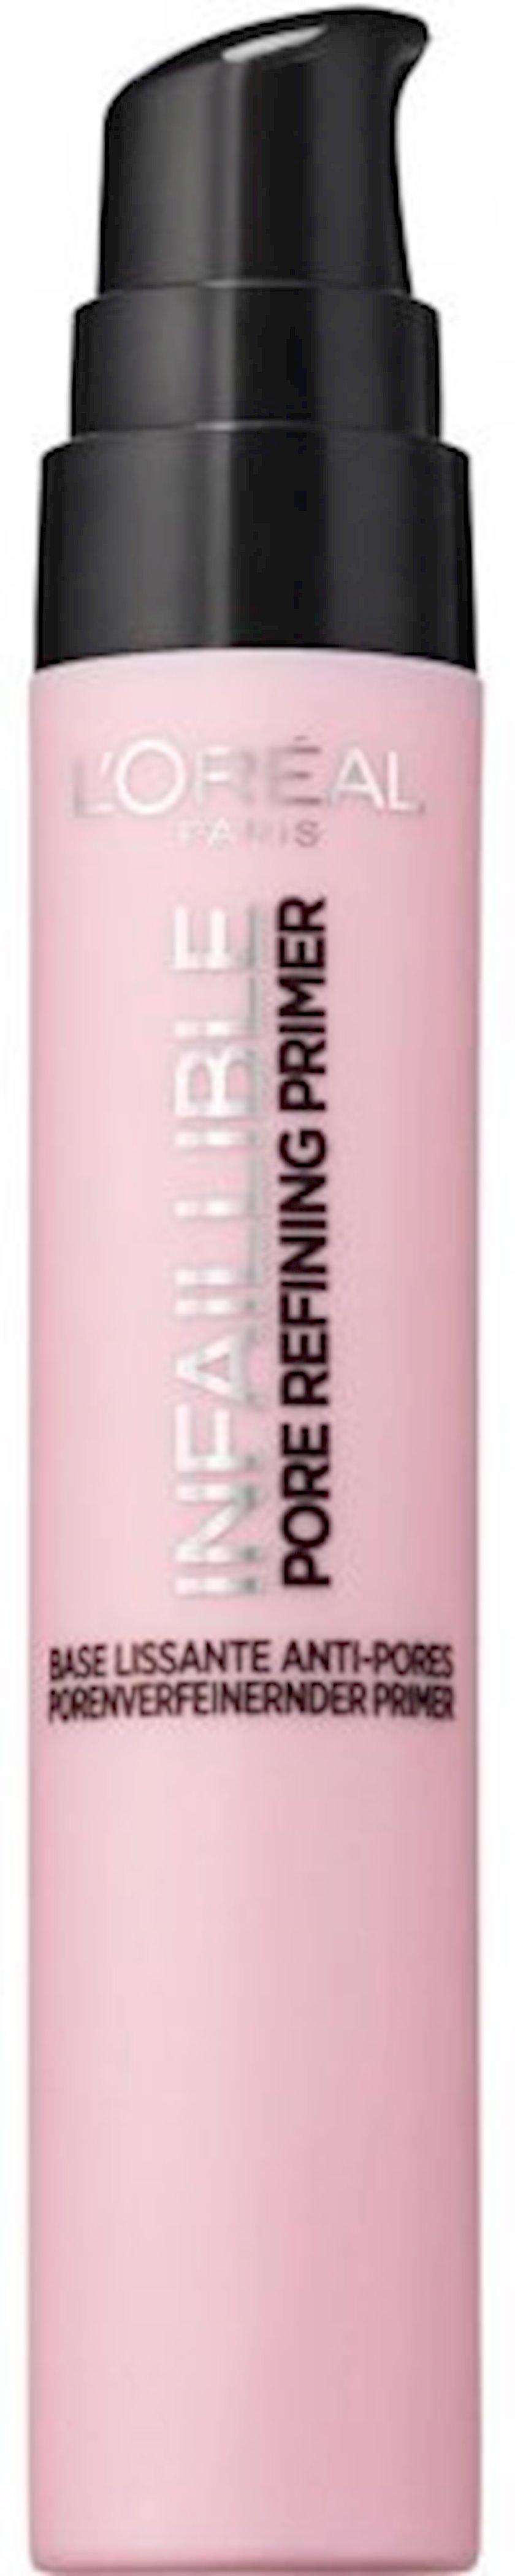 Makiyaj üçün baza L'Oréal Paris Infaillible Primer 06, 20 ml